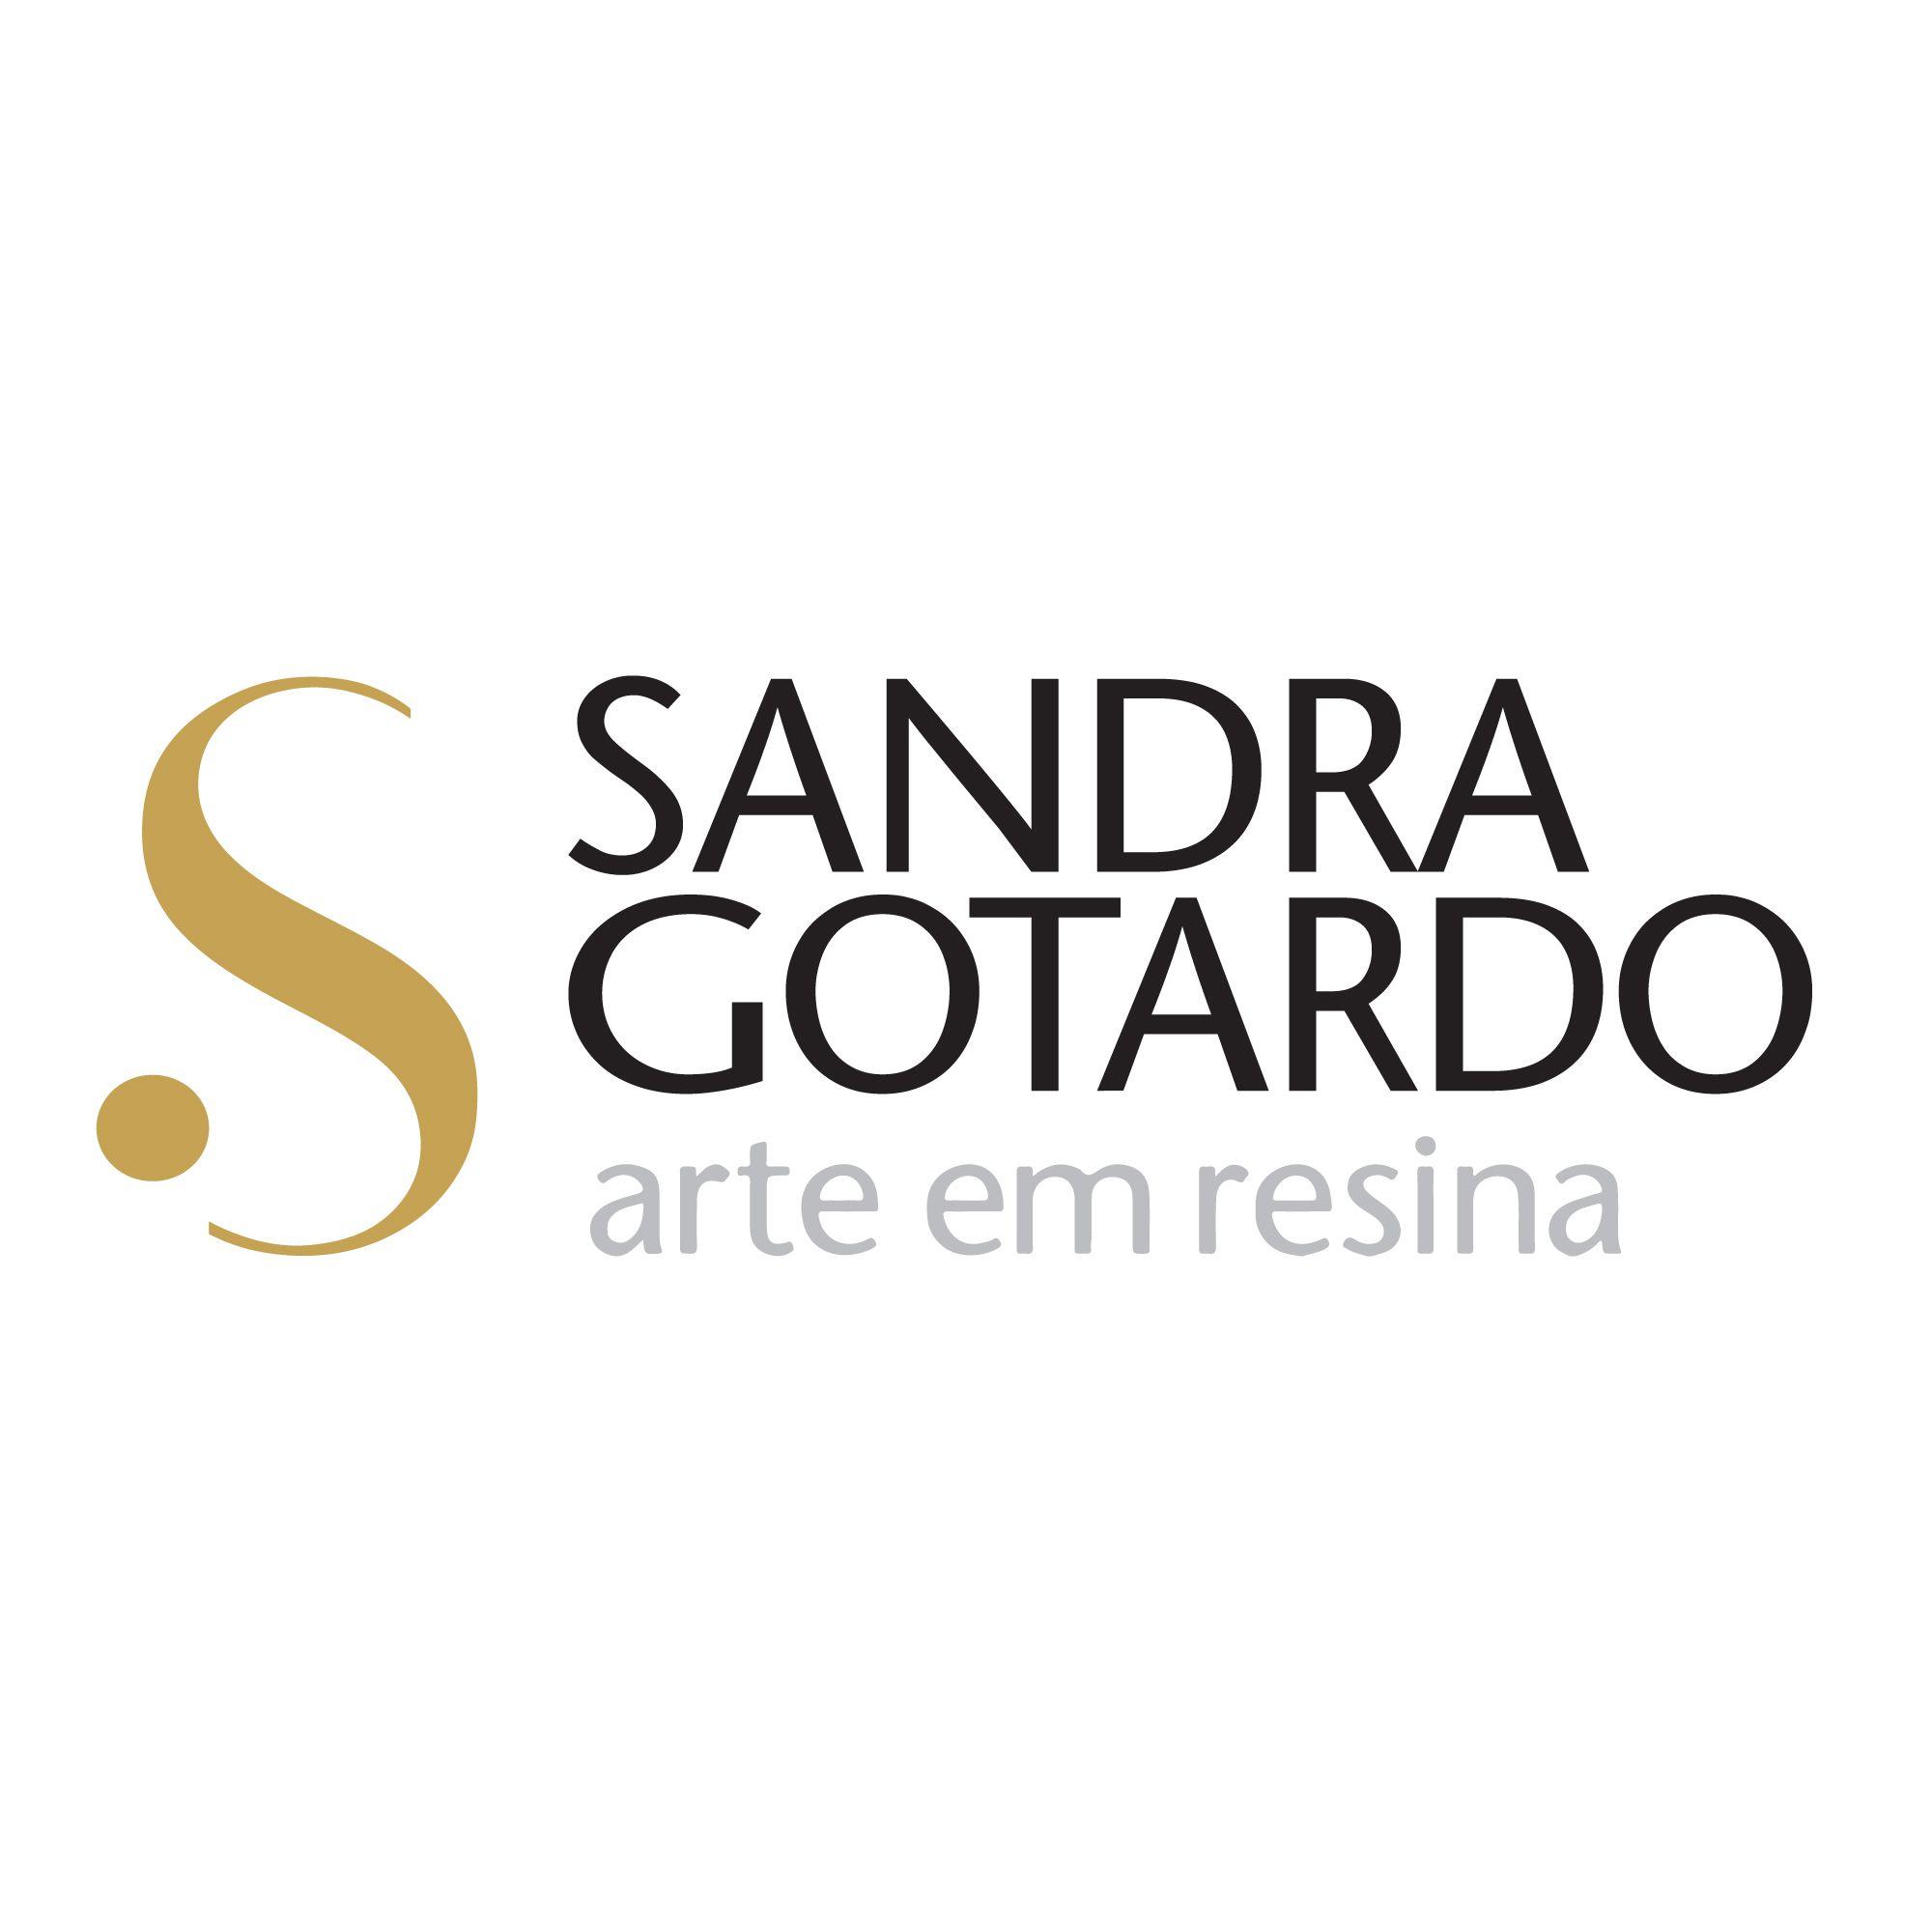 Bandeja Redonda dourada resinada Charlot06 - Sandra Gotardo